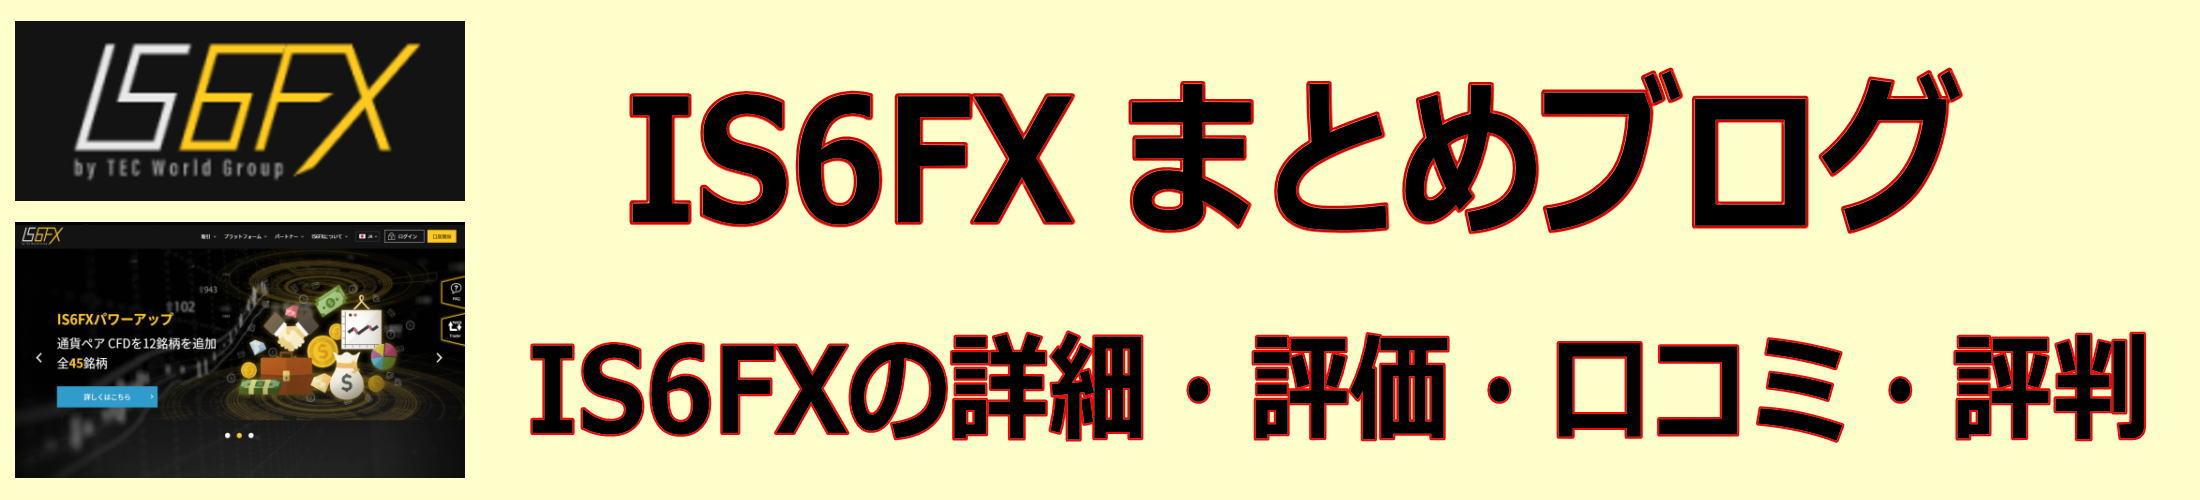 IS6FXの口コミ・評判・詳細・概要・レビュー・比較